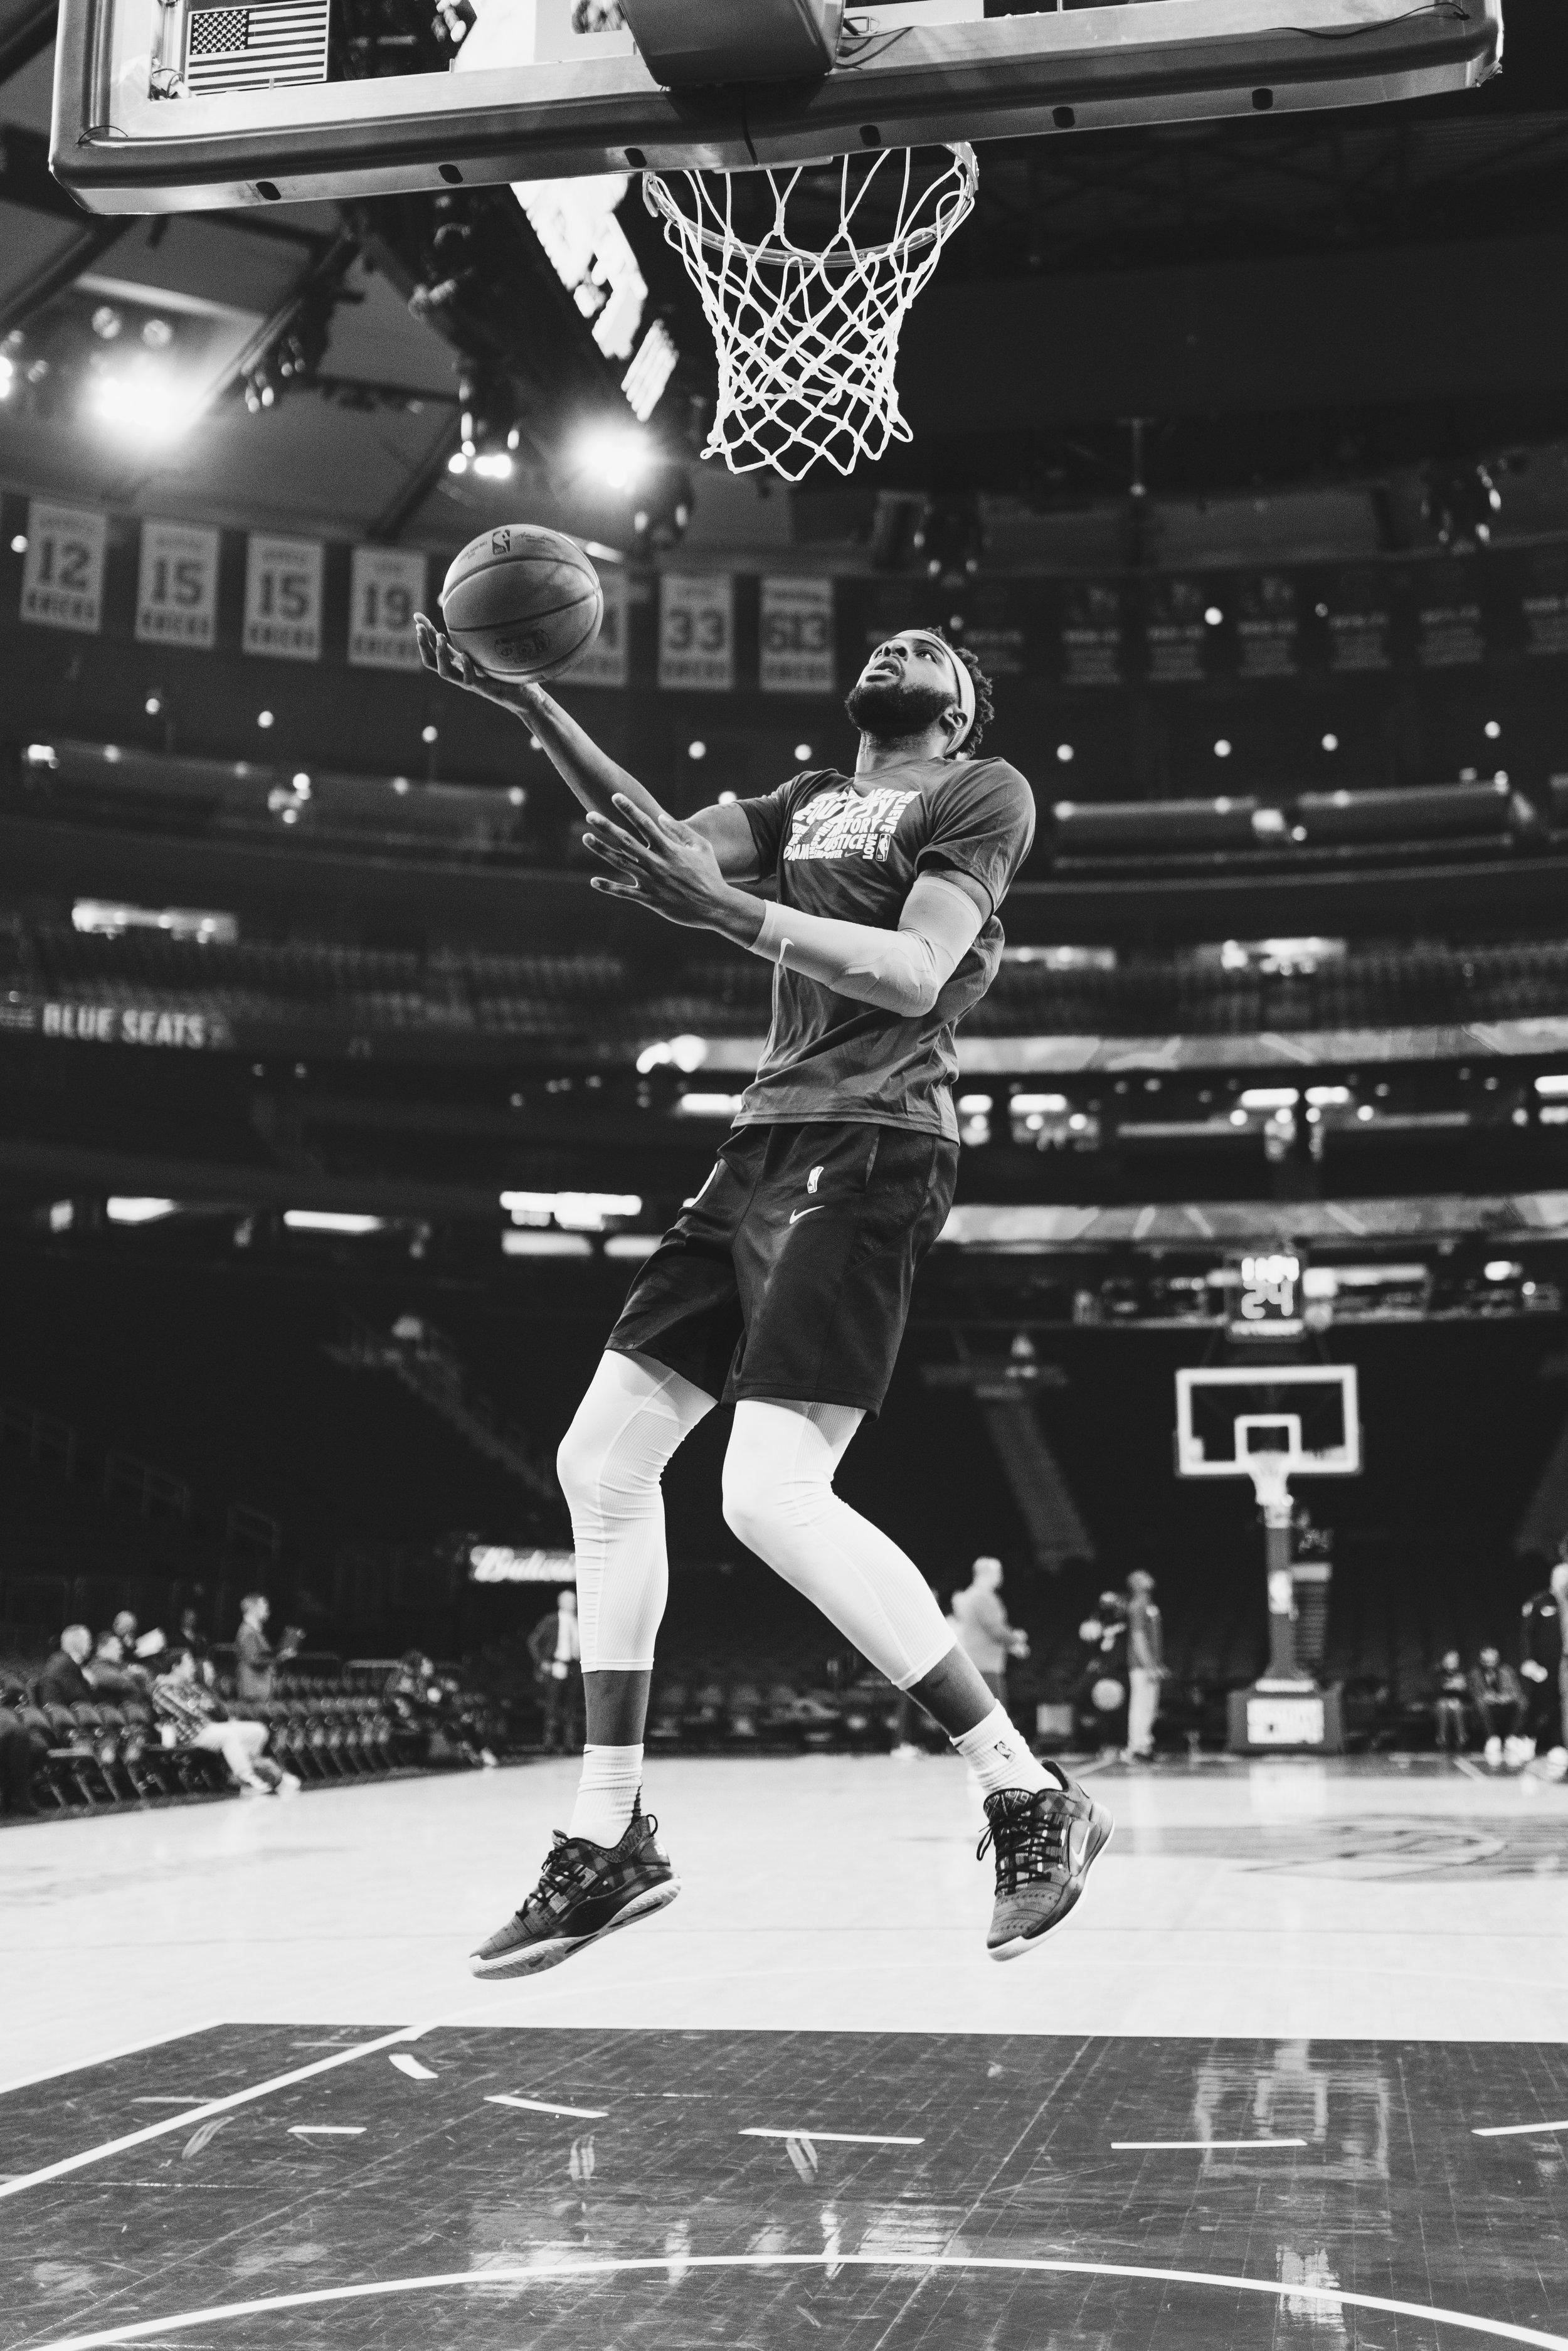 Knicks-Squarespace-MichaelEng-2.jpg